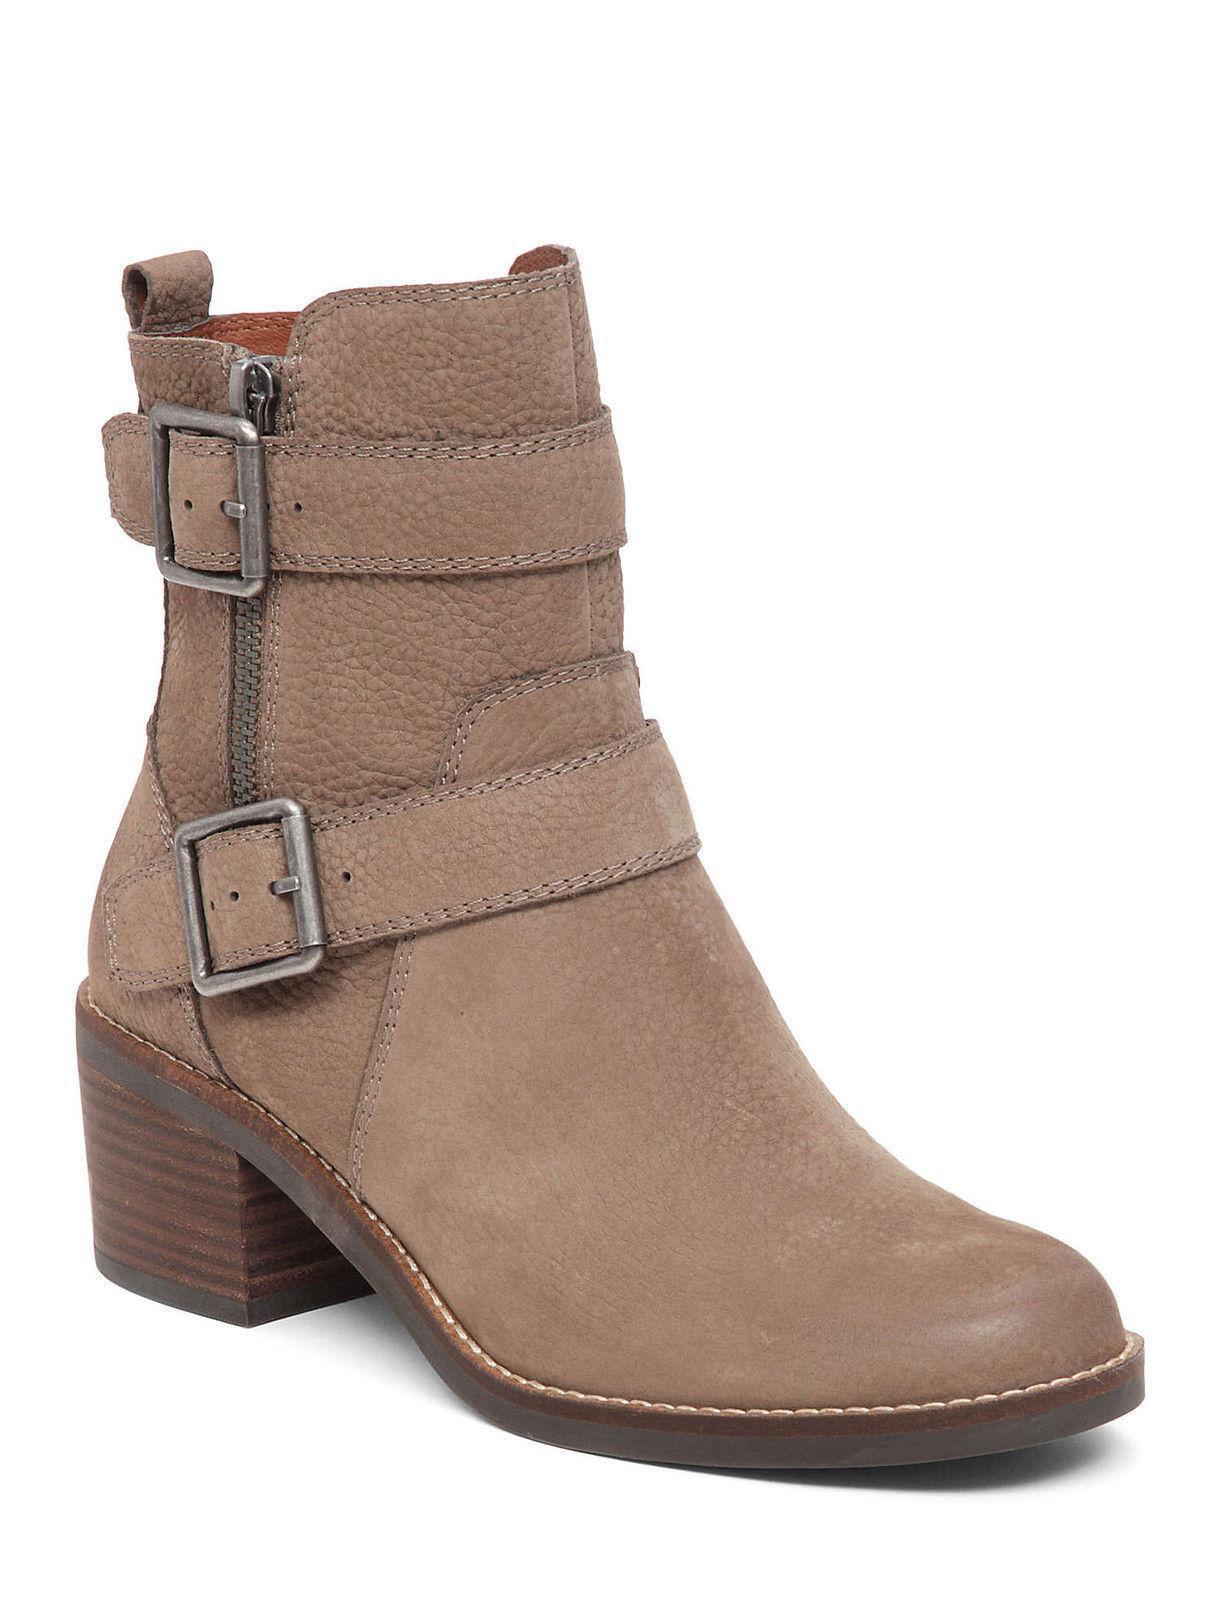 Lucky Brand Women's LK-CASTILLAS  Ankle Bootie 8 $129.99